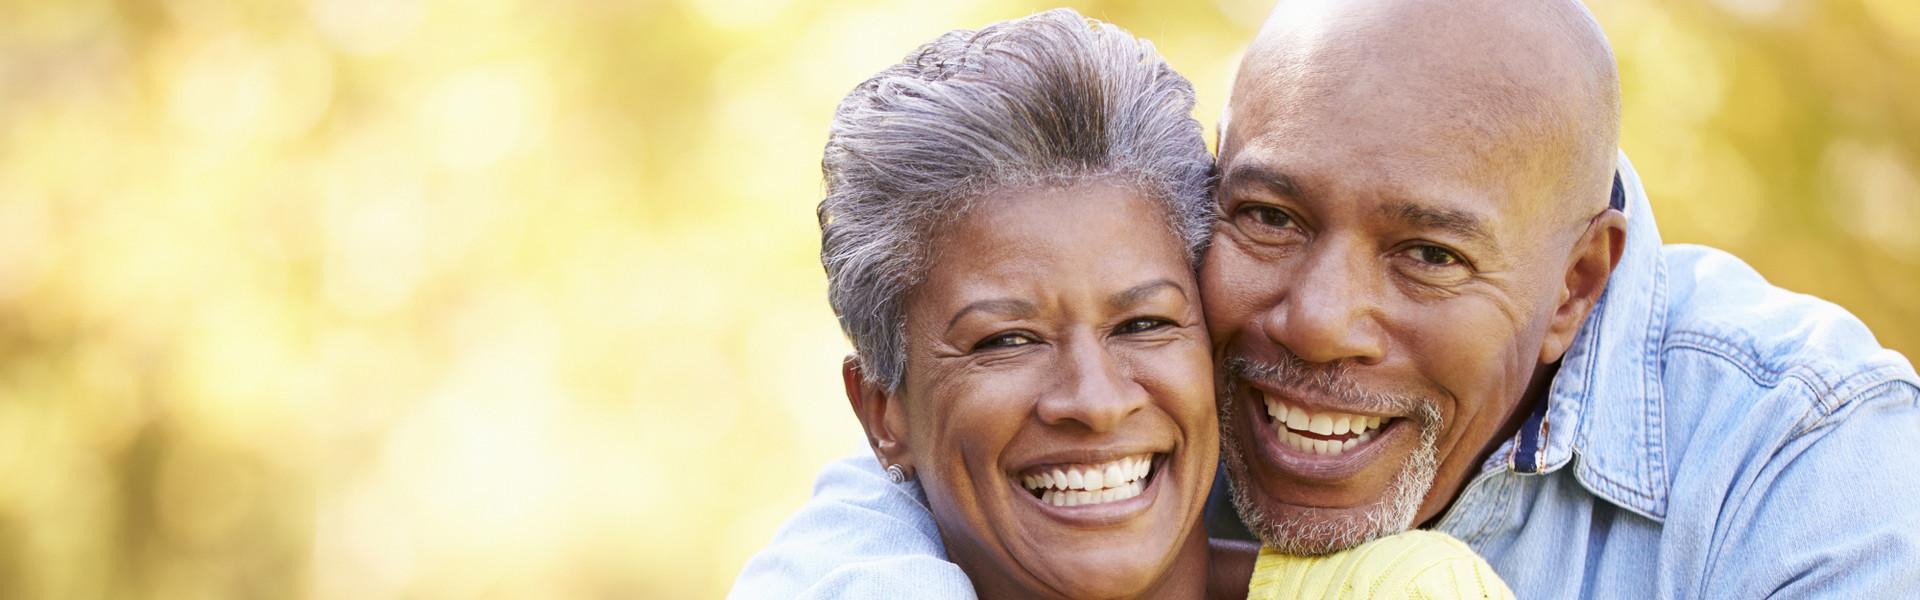 Seniors enjoying our senior hotel discounts in Orlando, FL | Senior hotel rates | Westgate Lakes Resort & Spa